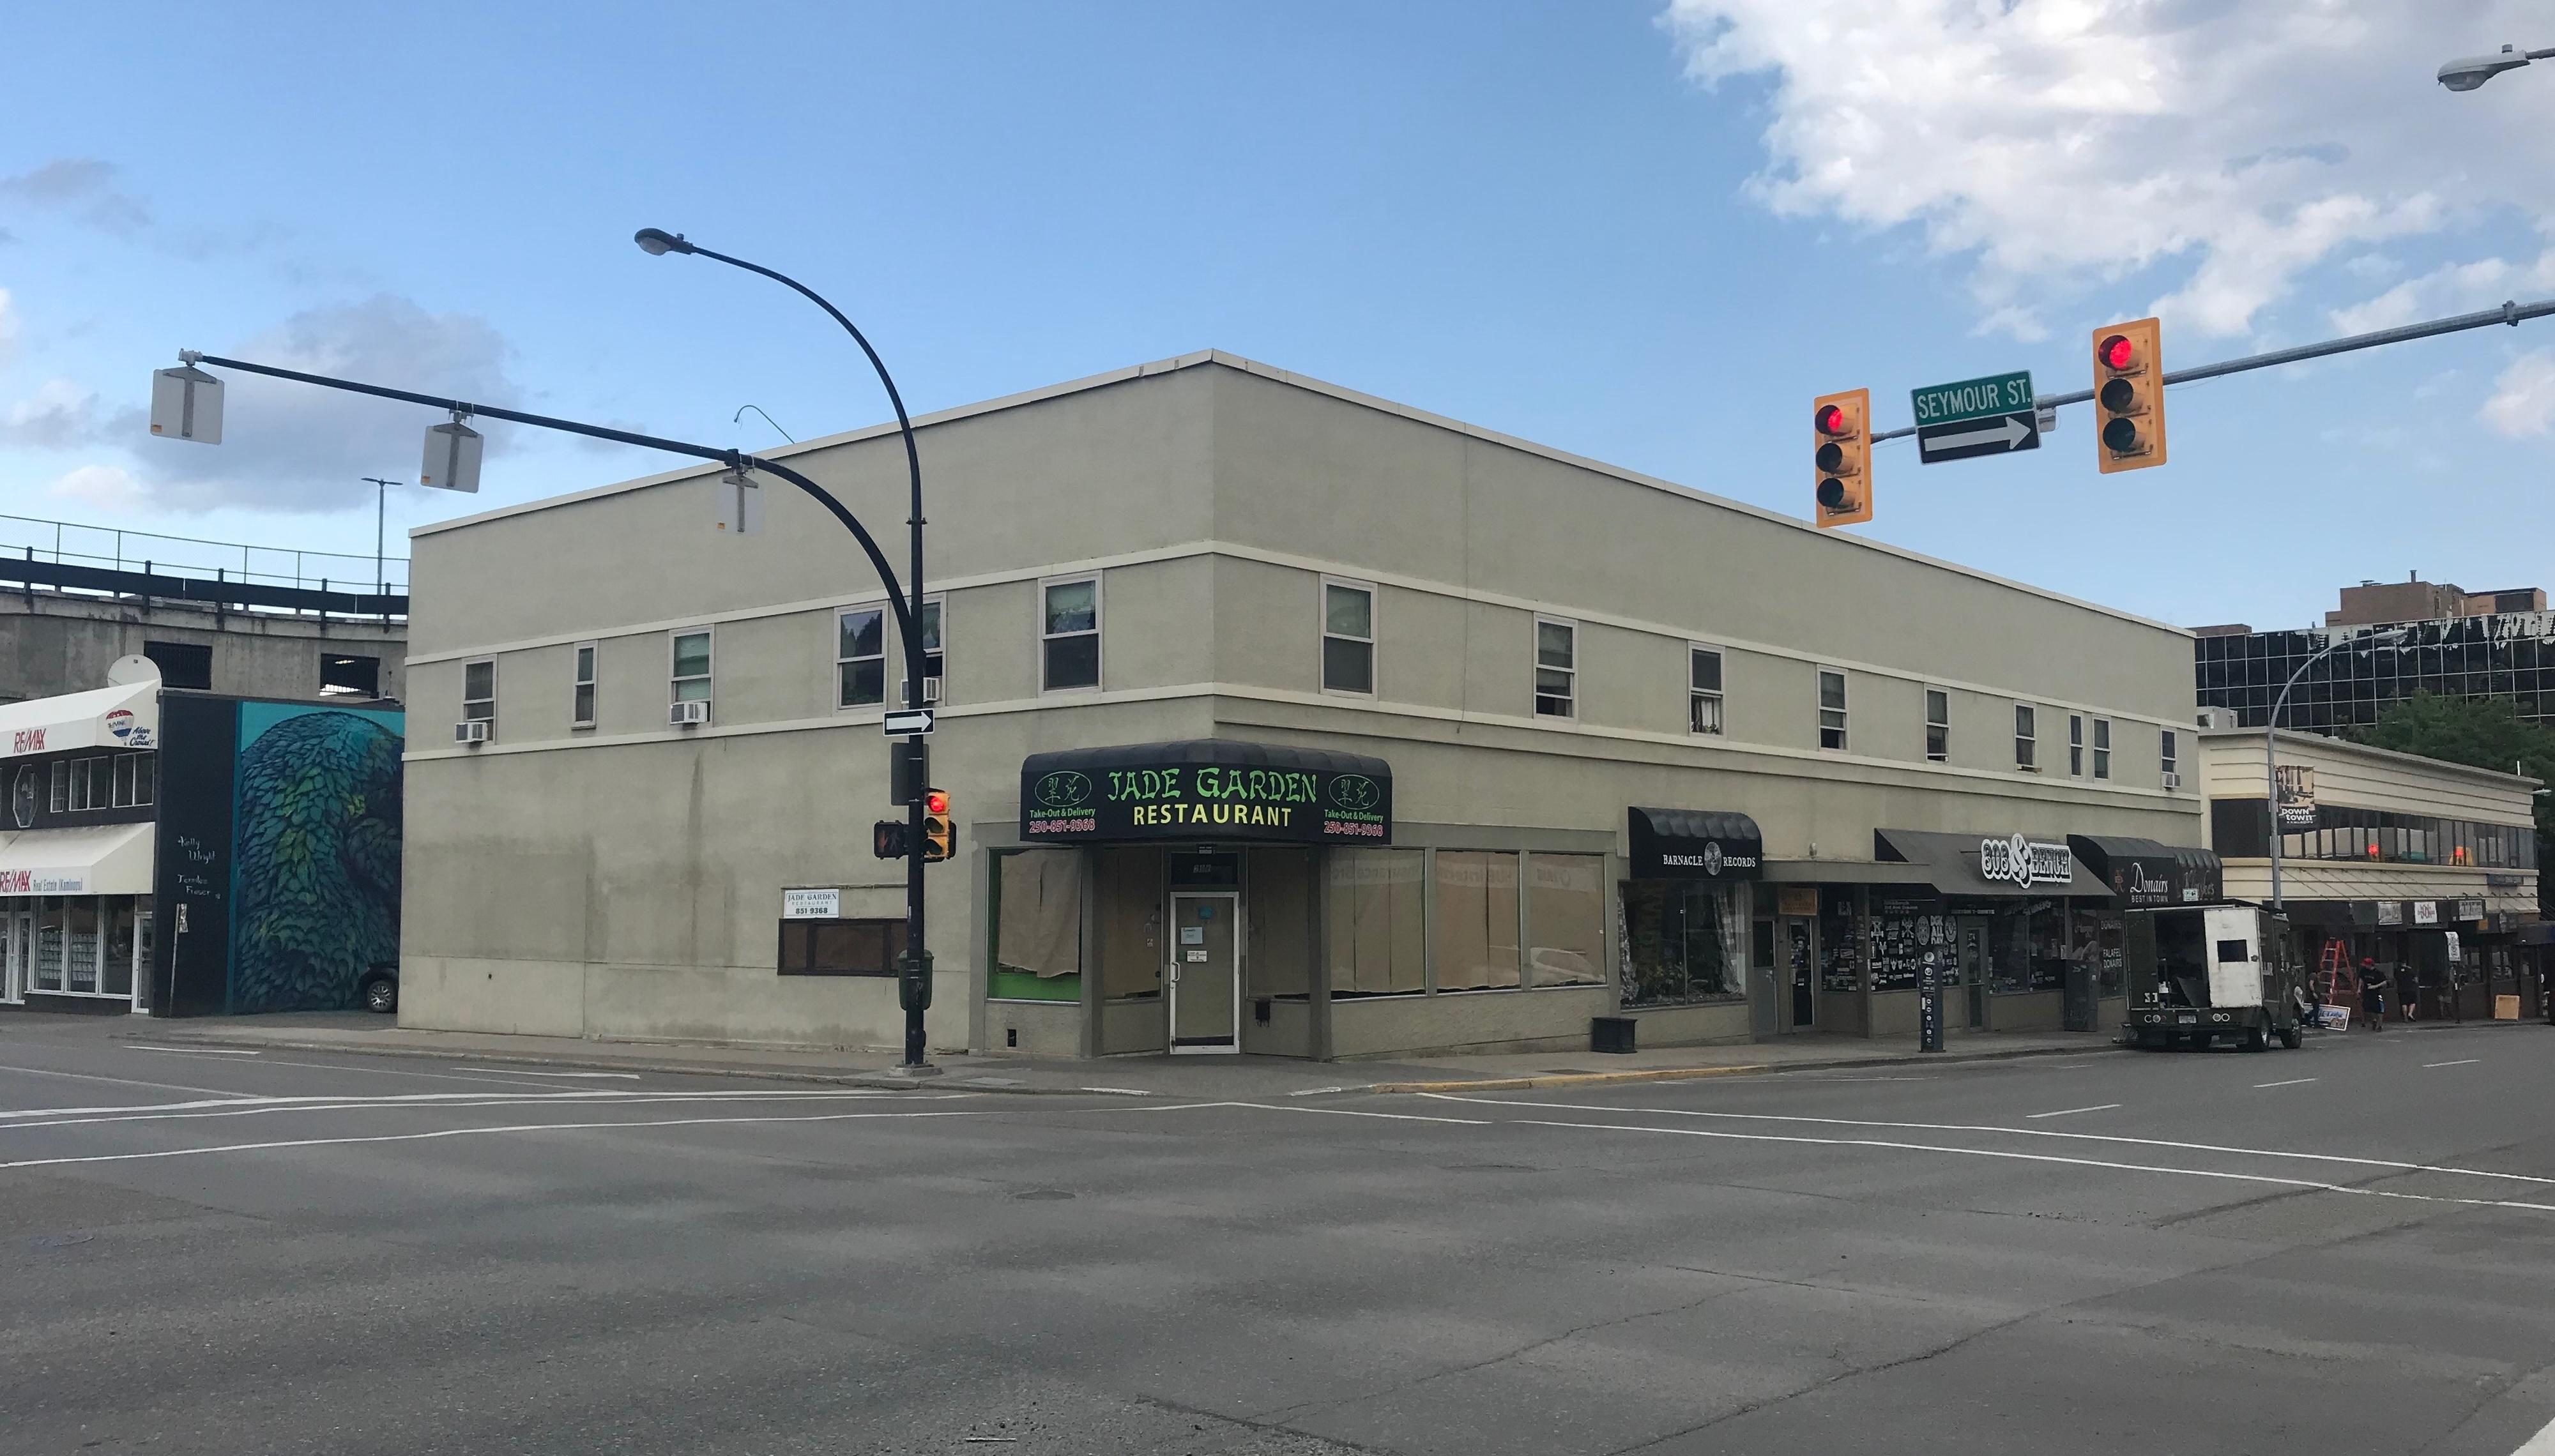 jade garden restaurant in downtown kamloops has closed